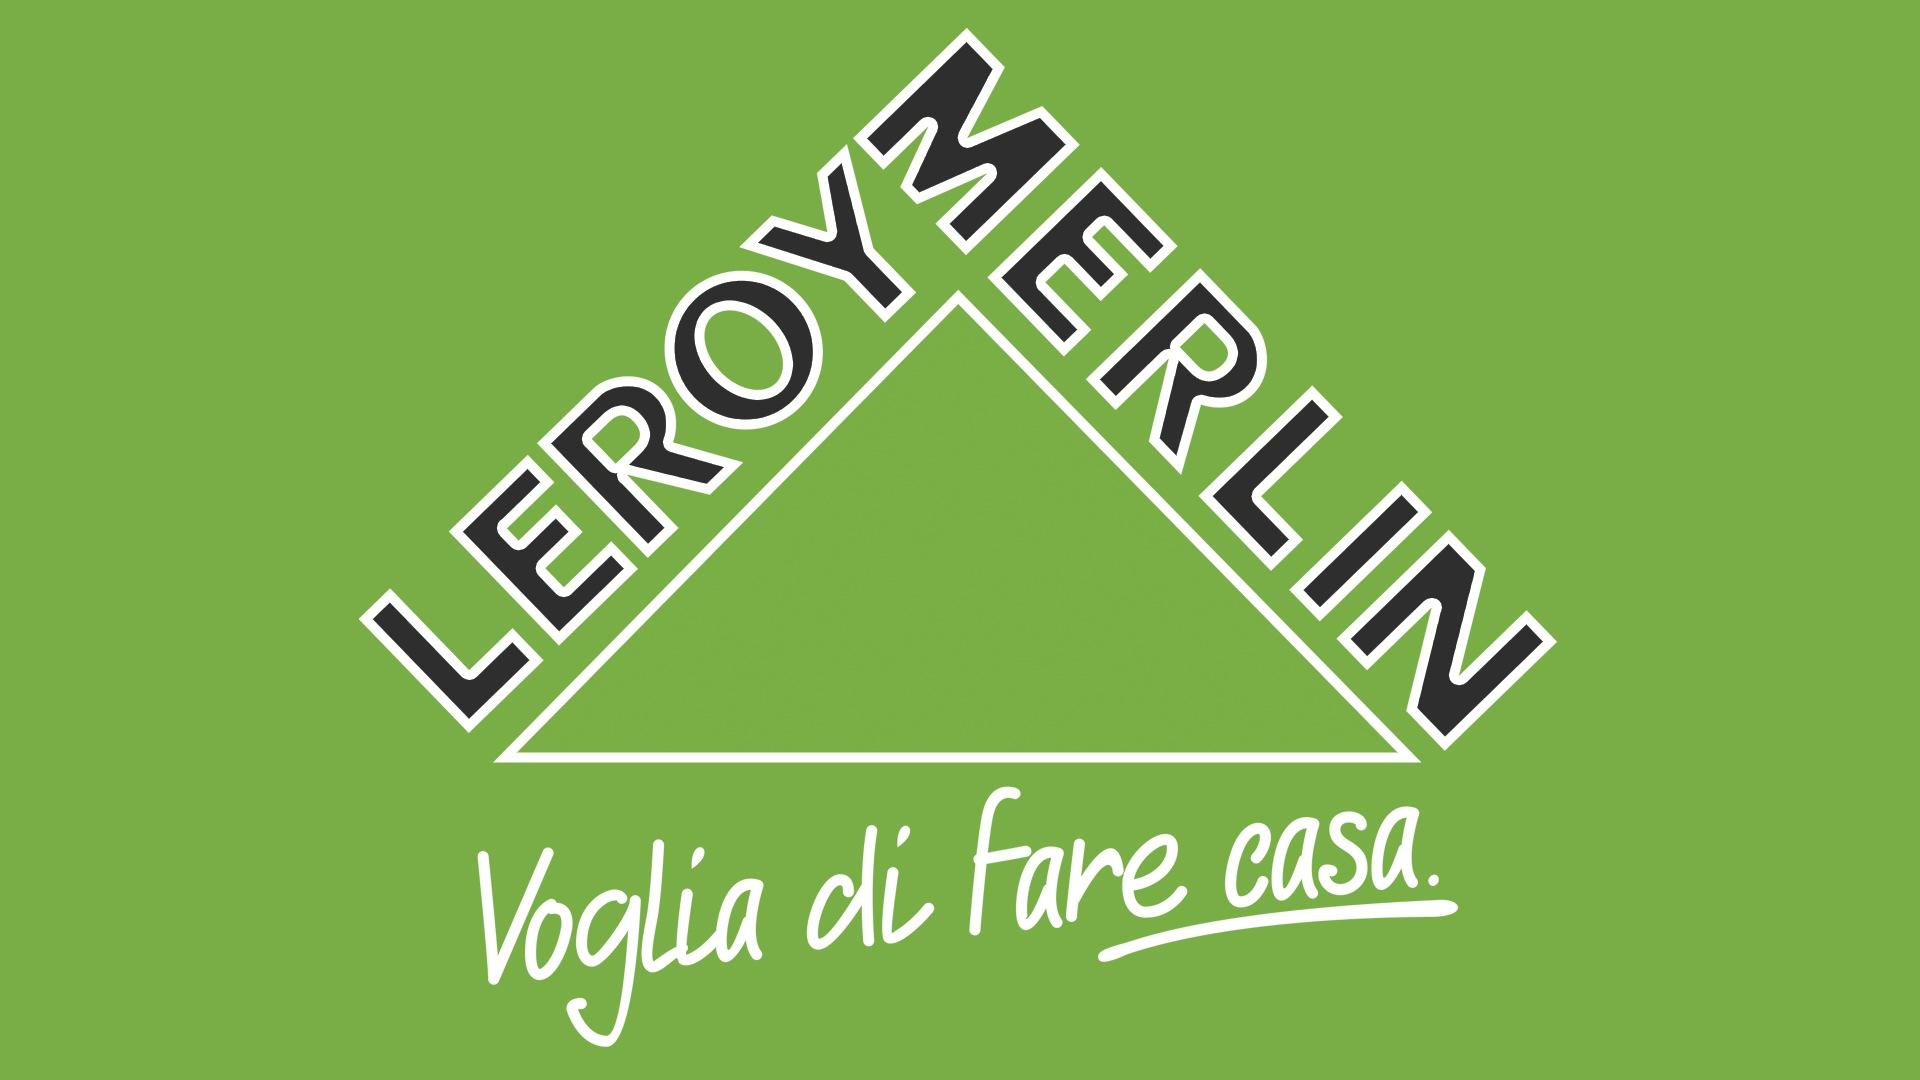 Leroy merlin logo histoire et signification evolution for Marlen leroy